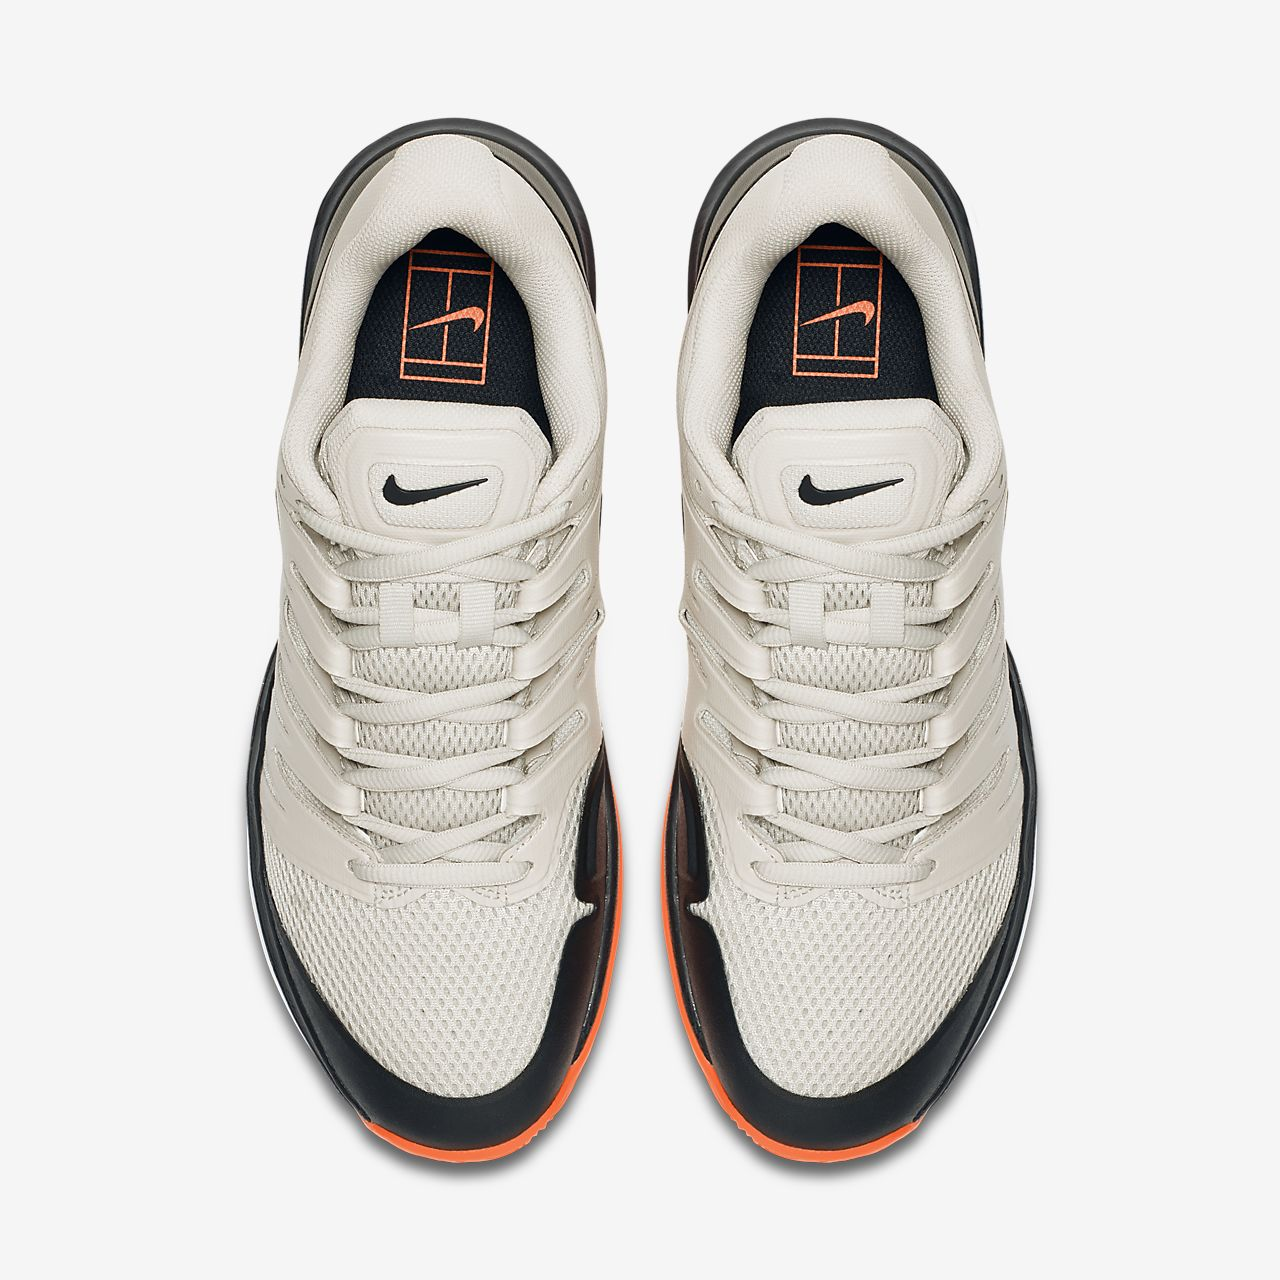 Nike NikeCourt Air Zoom Prestige Herre Tennissko Nettbutikk